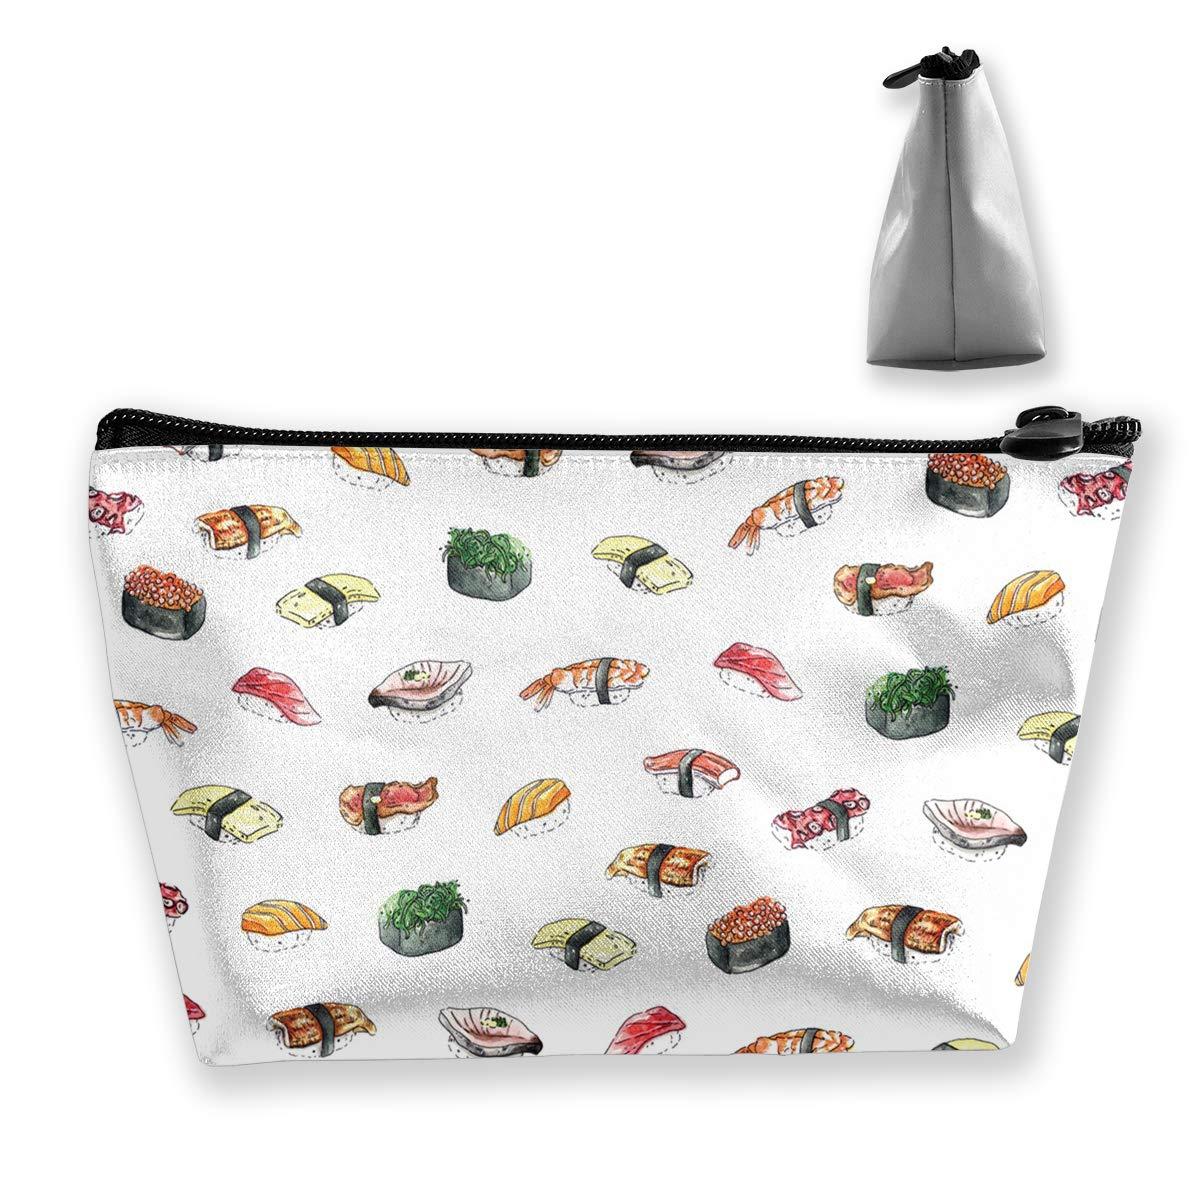 Trapezoid Toiletry Pouch Portable Travel Bag Sushi Pattern Pen Organizer